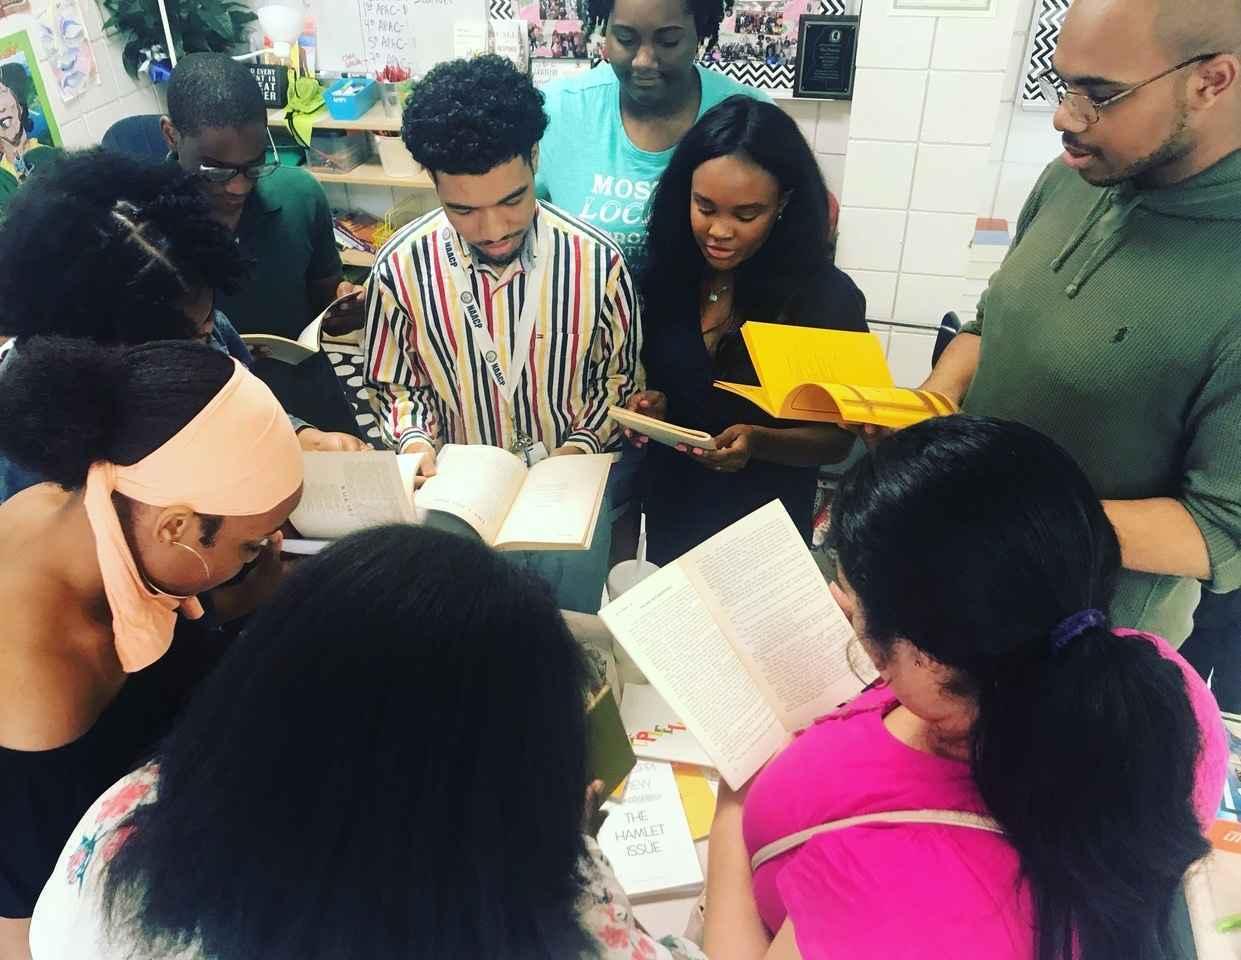 Support Murrah High School's literary and arts magazine. image